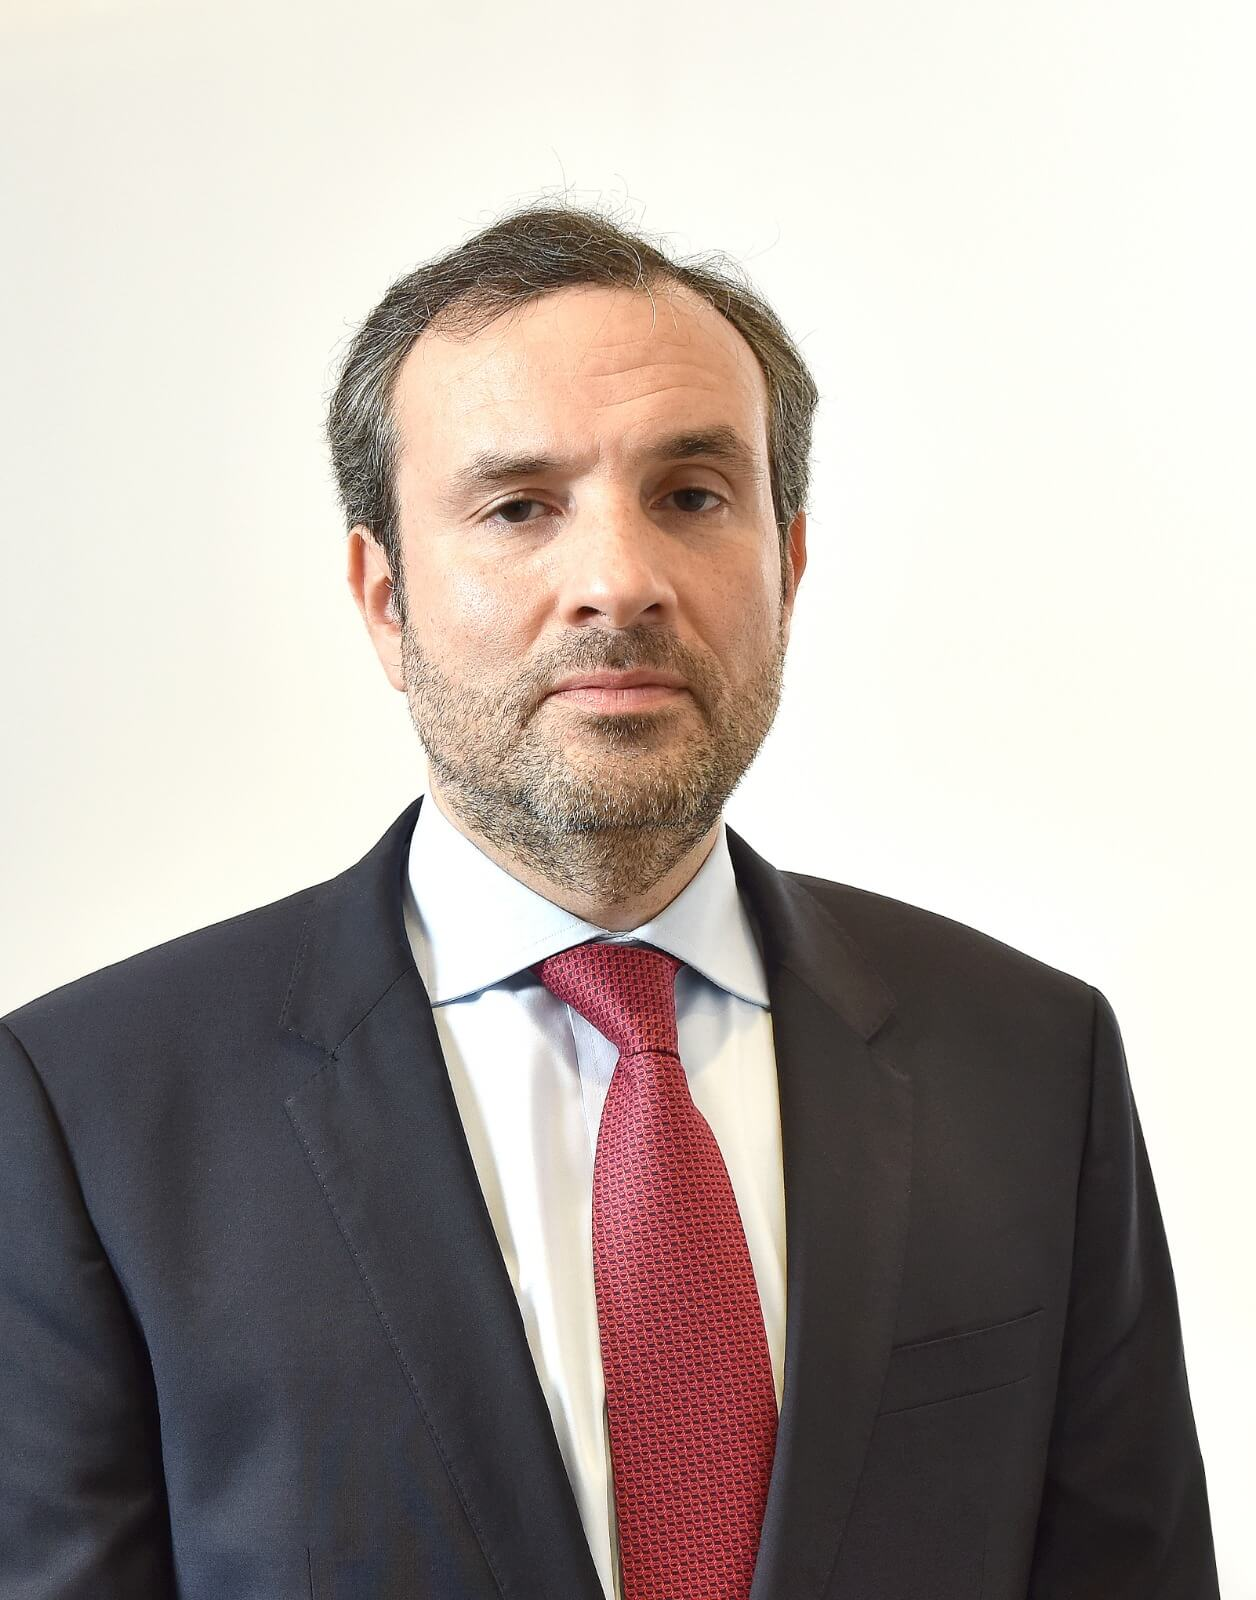 Ahmed Abou Zaid